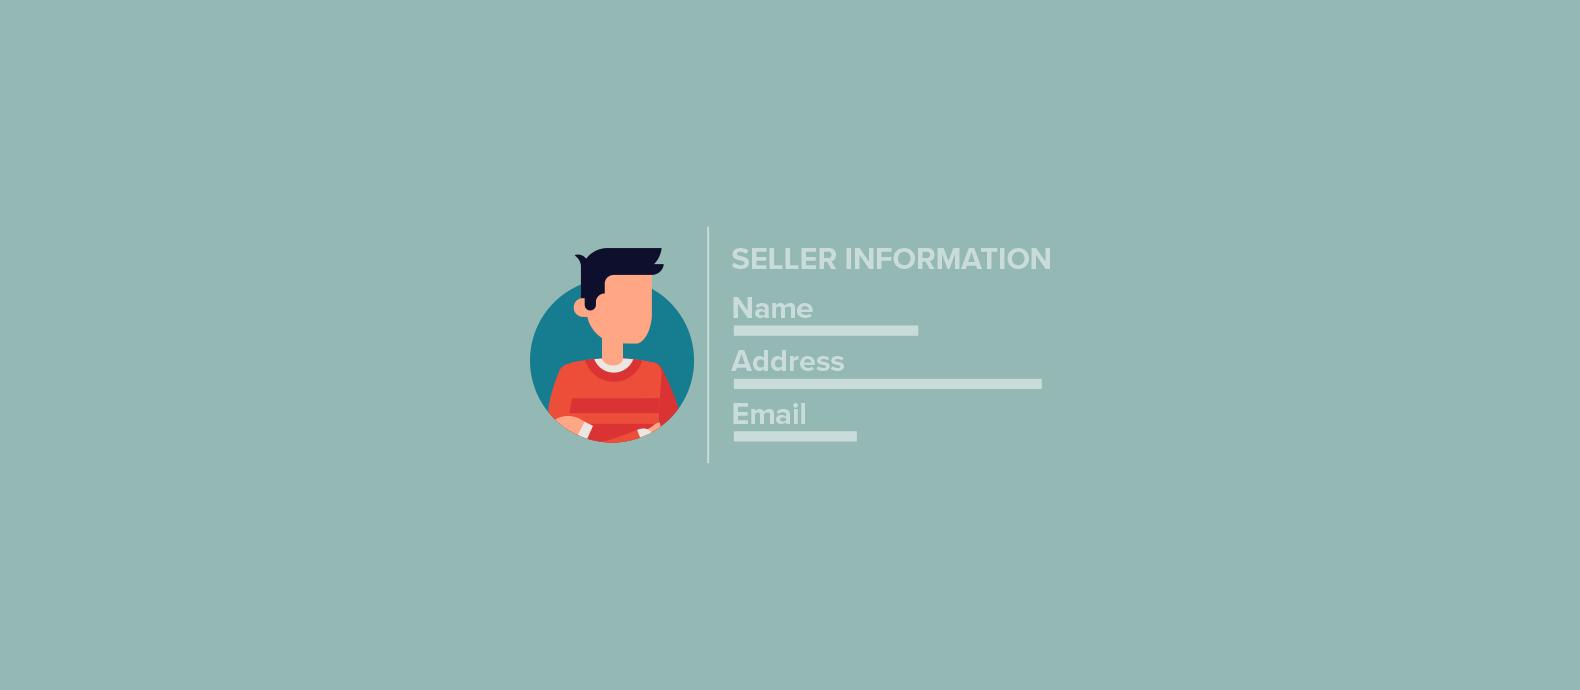 clustering technology seller information